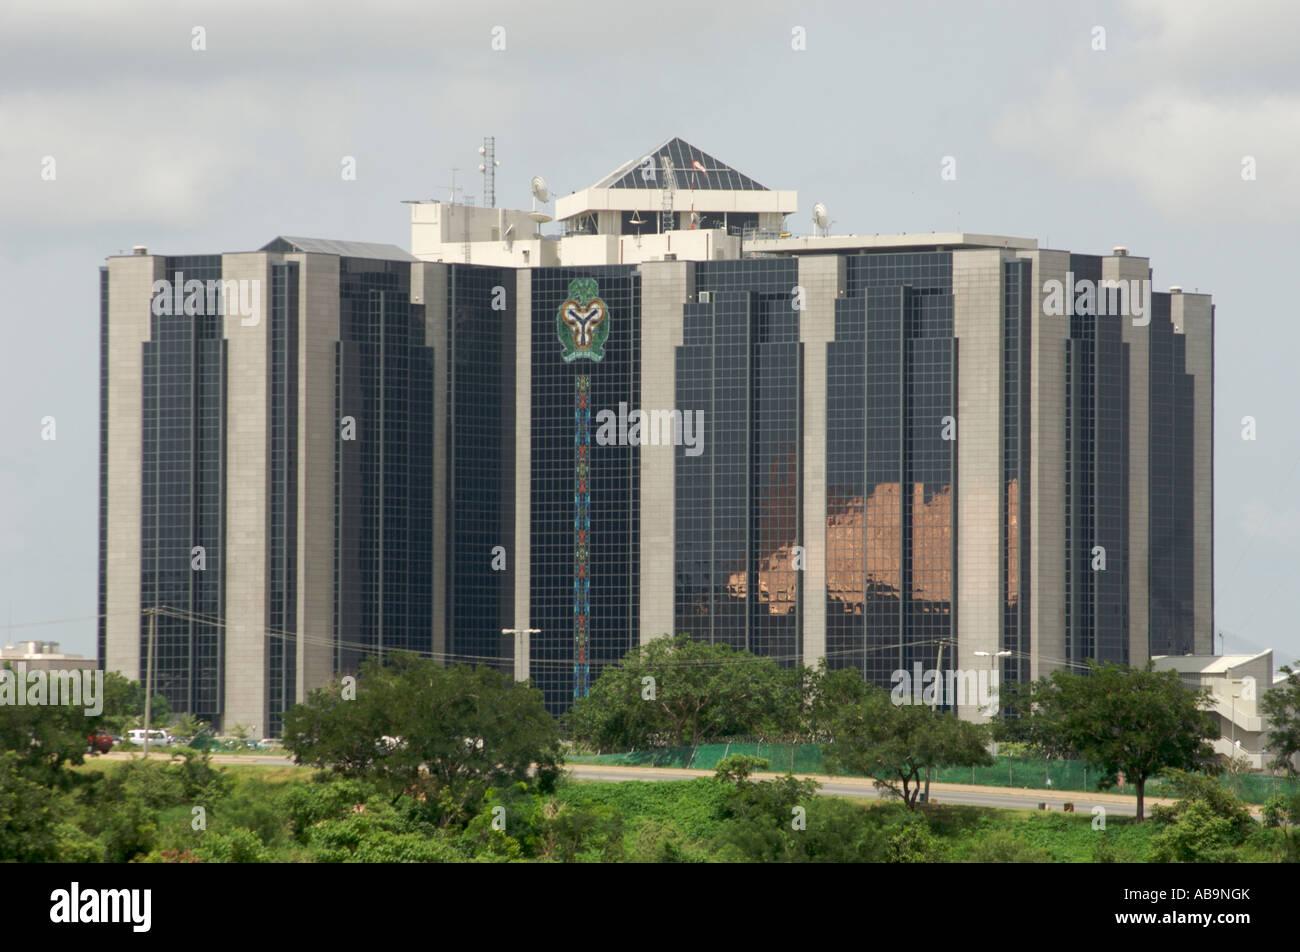 La banque centrale du nigéria abuja nigéria photo stock